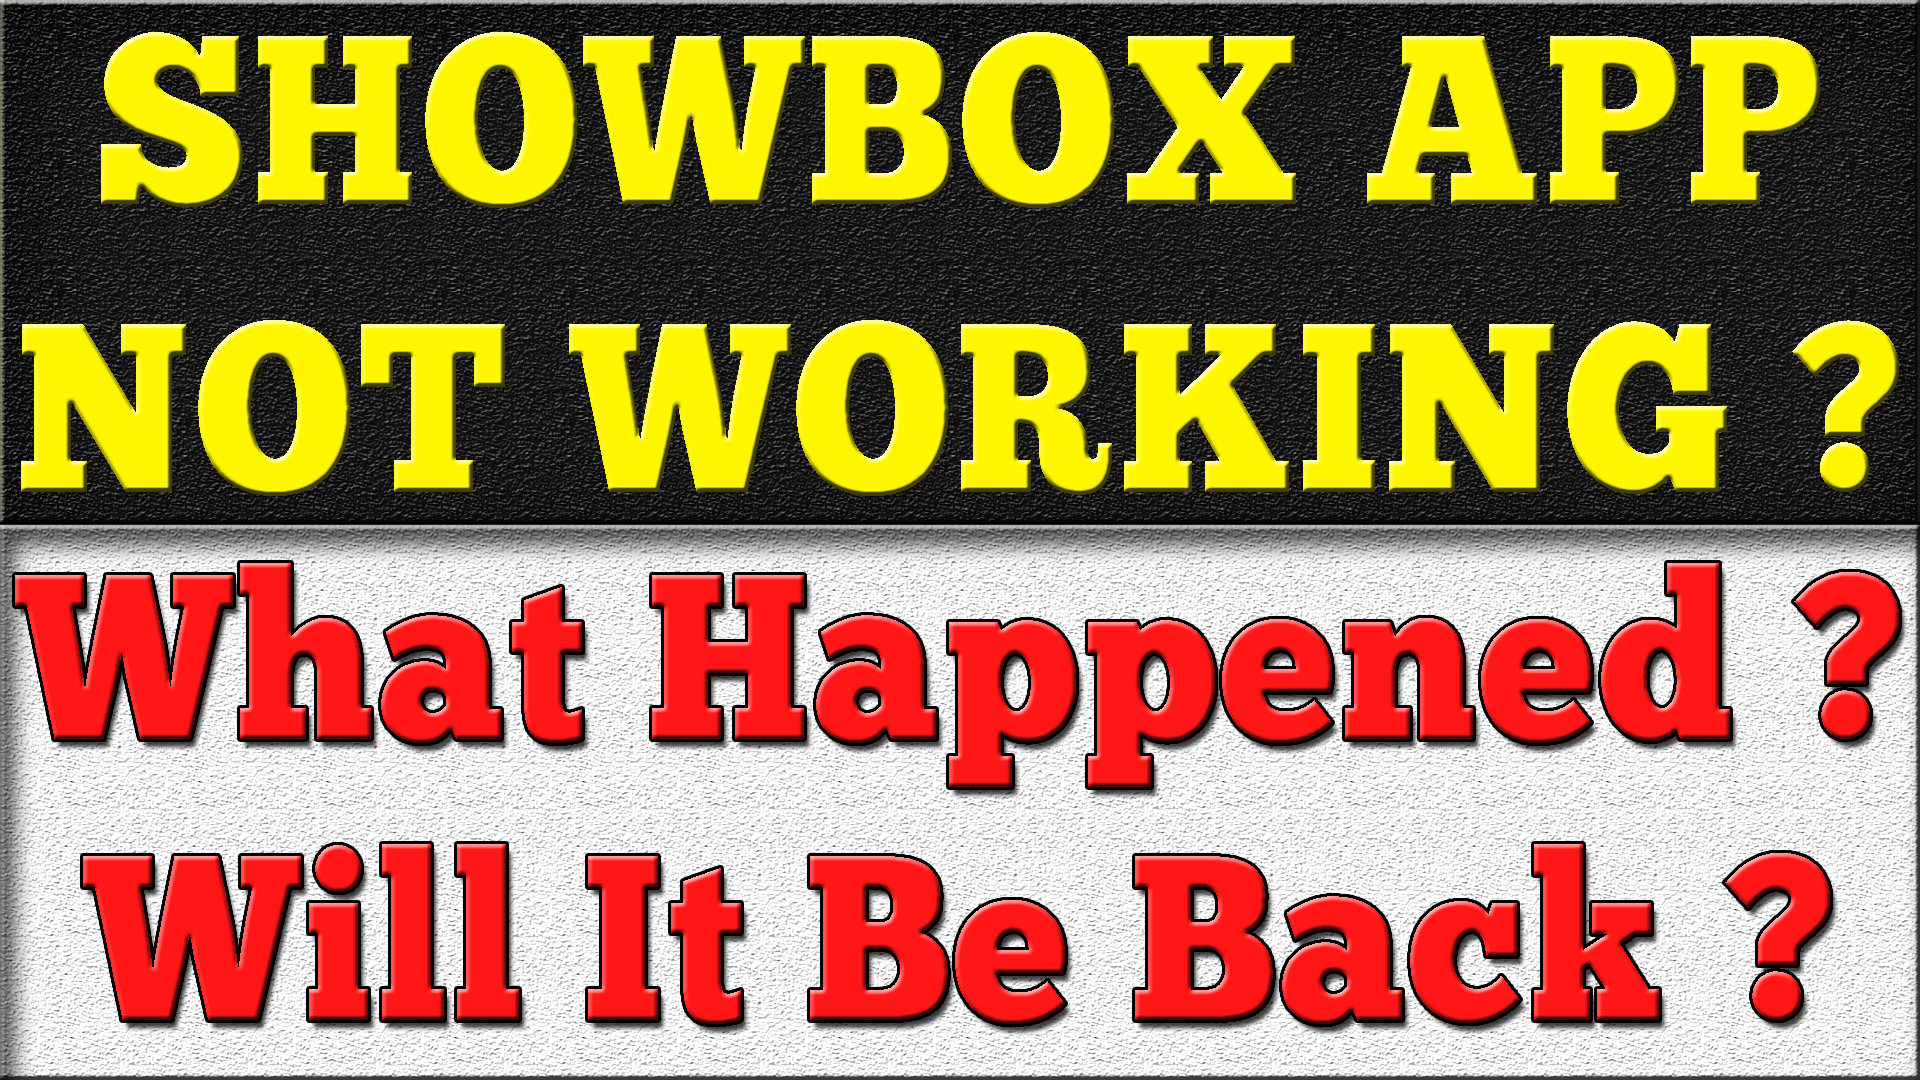 Showbox App Not Working